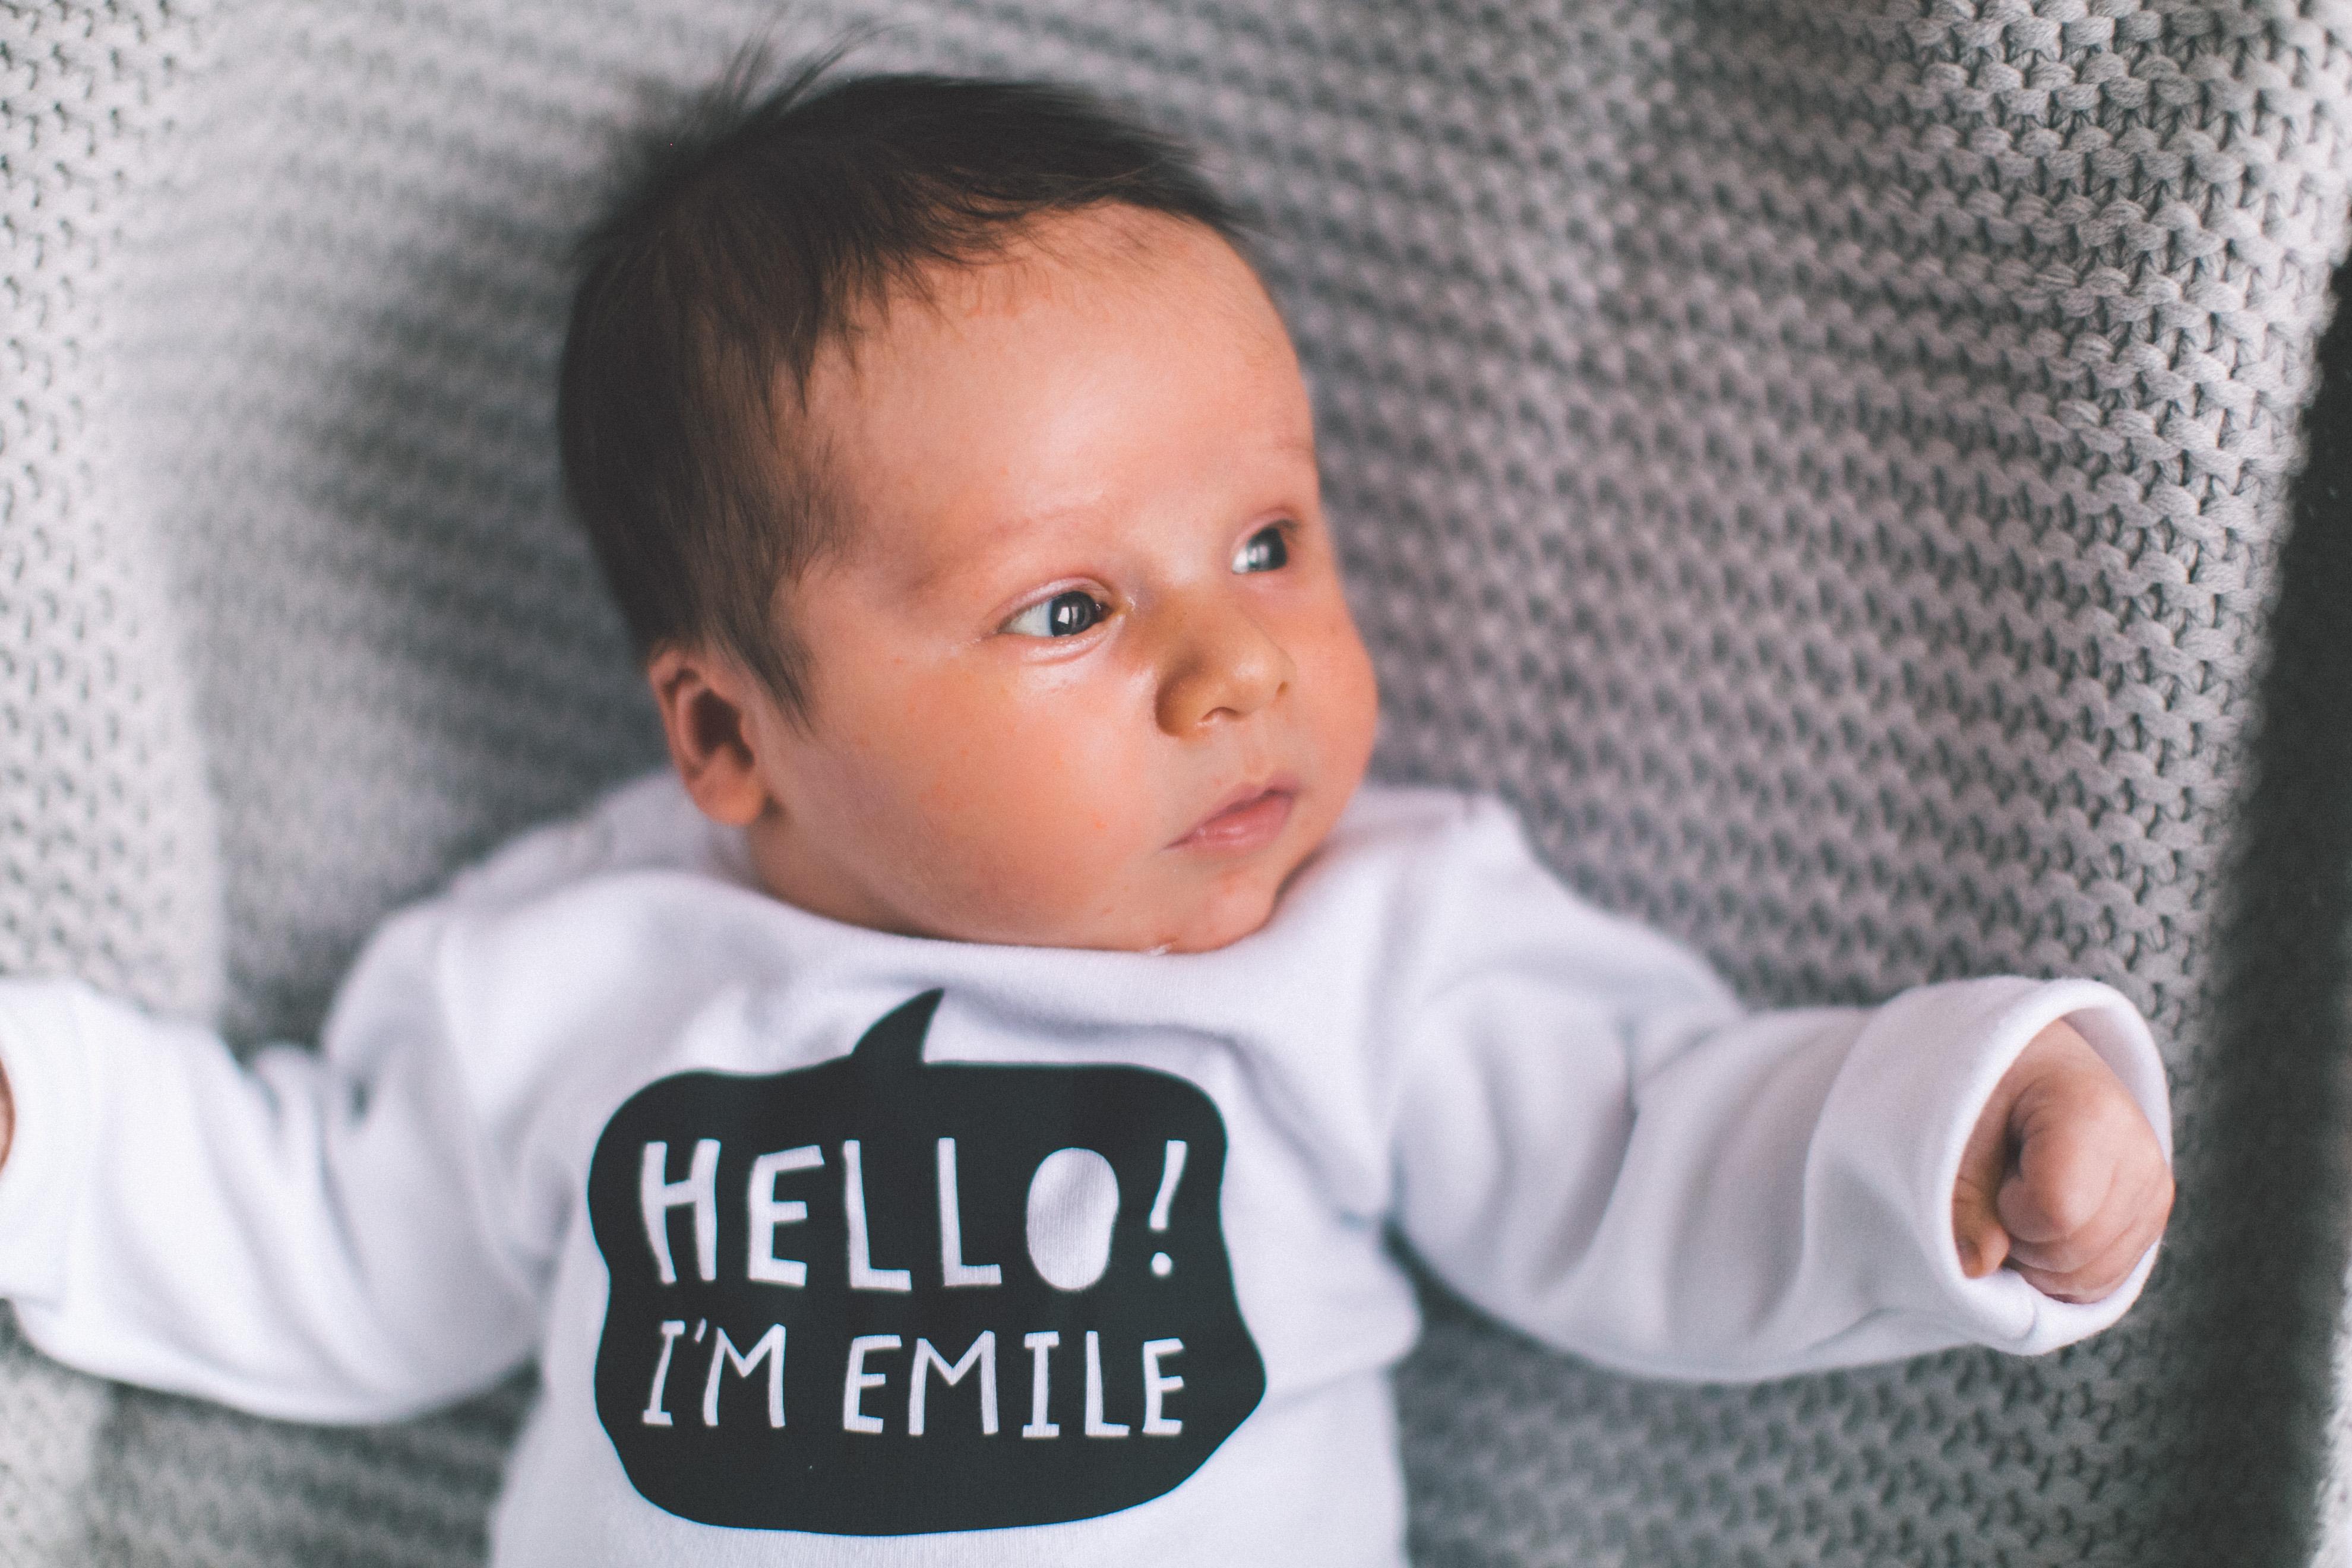 EMILE-9130